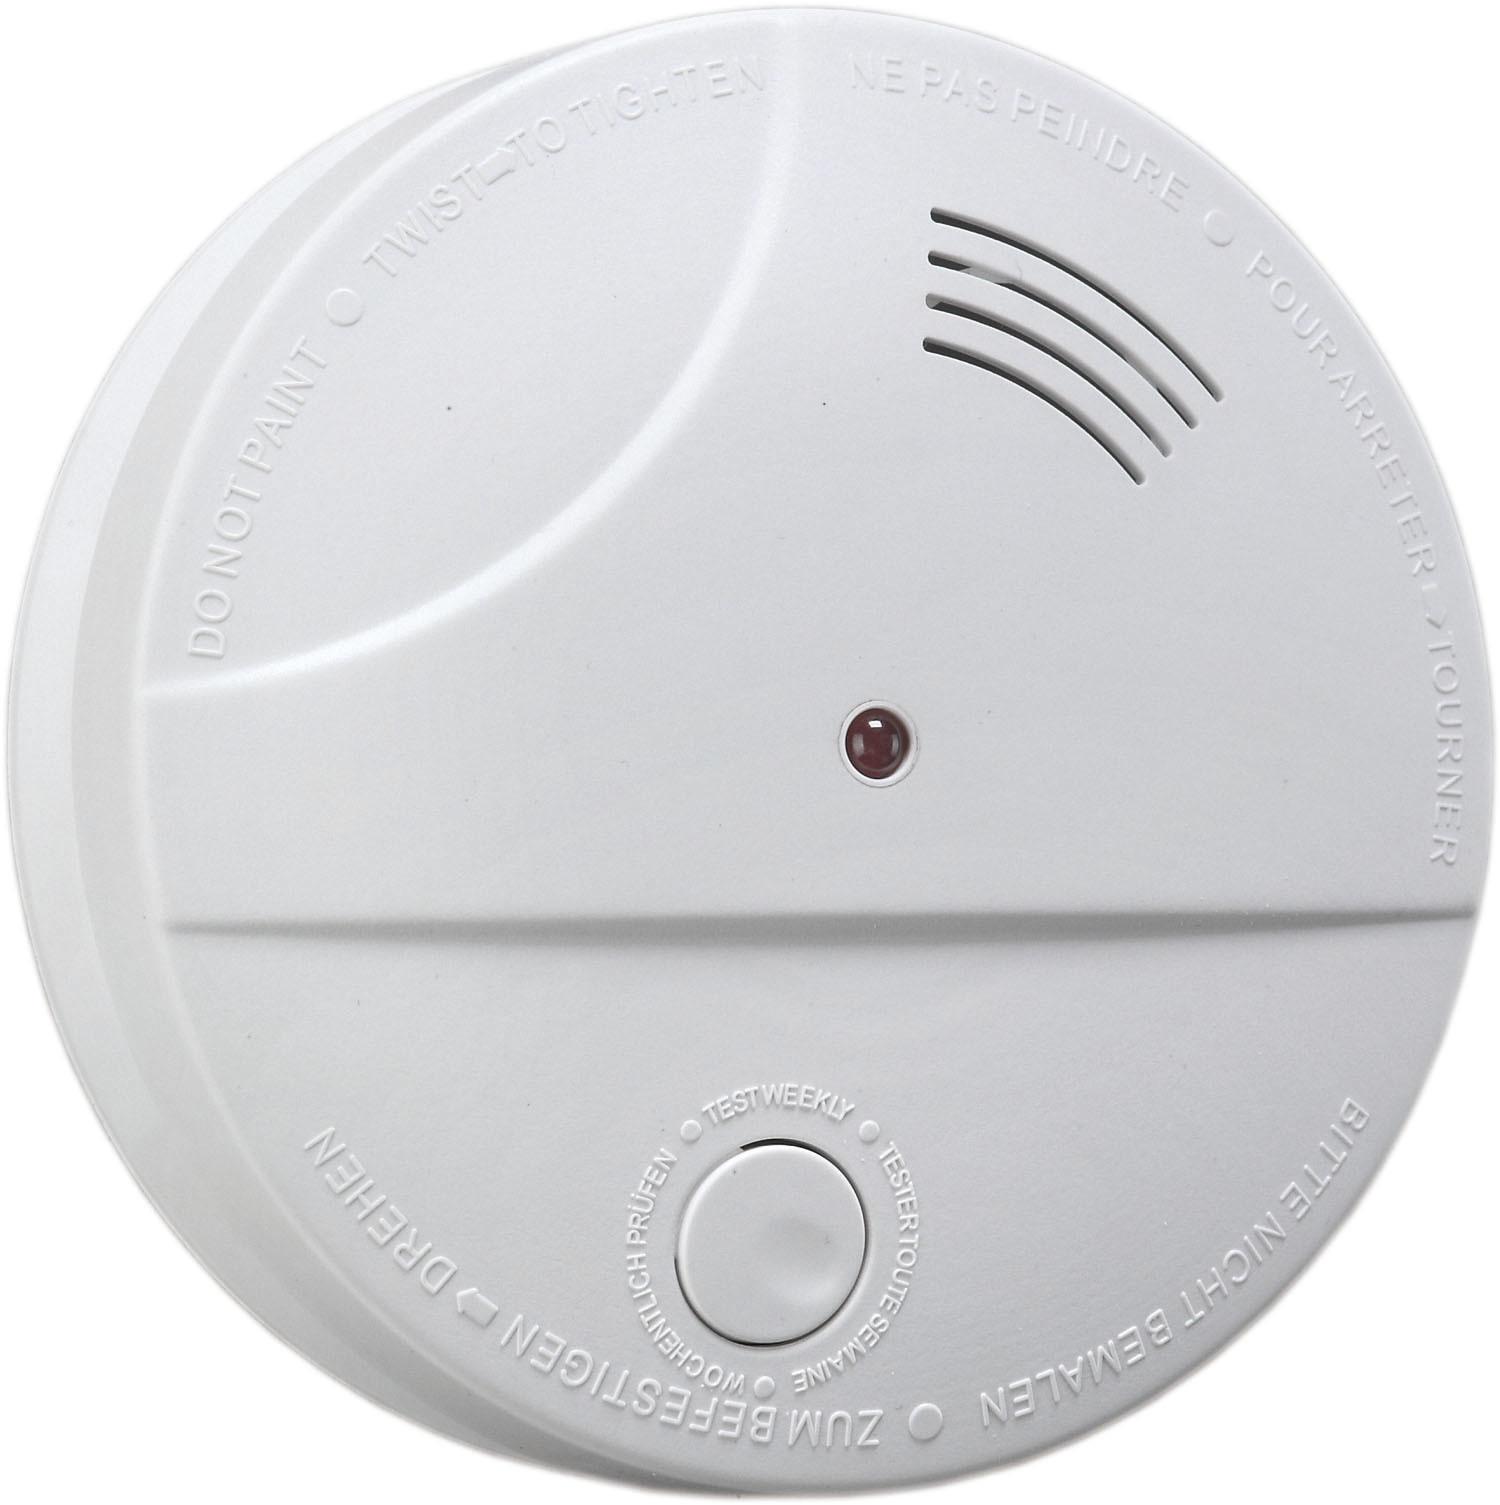 china stand-alone smoke detector alarm